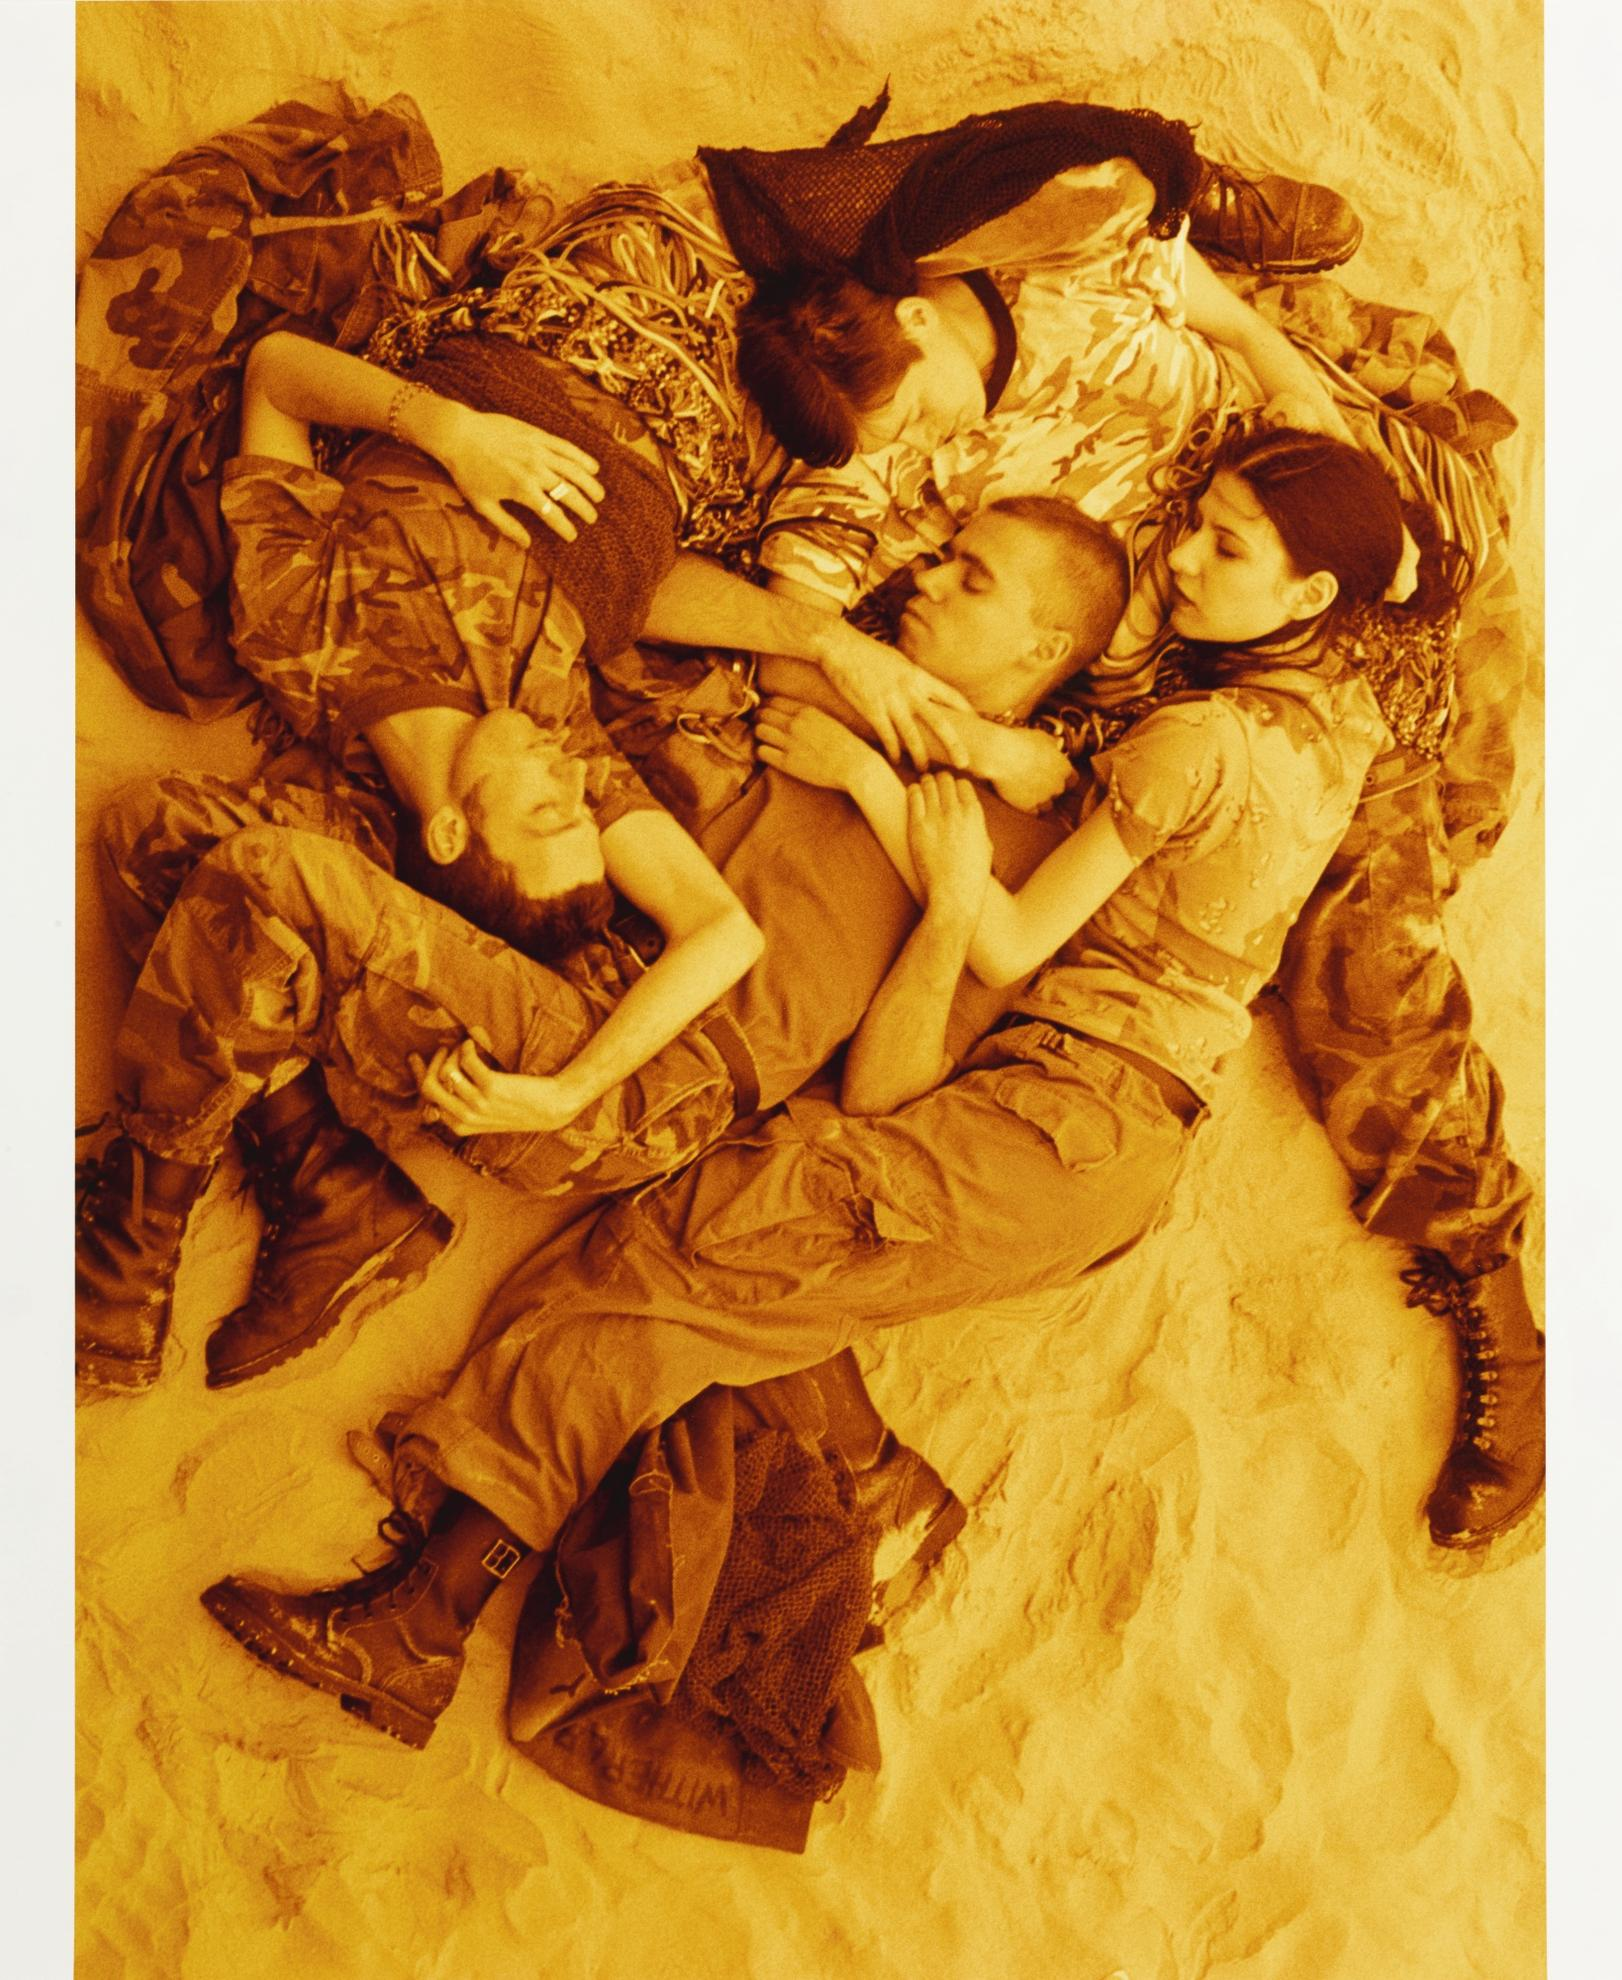 Wolfgang Tillmans-Lutz, Alex, Susanne & Christoph On Beach (Orange)-1993